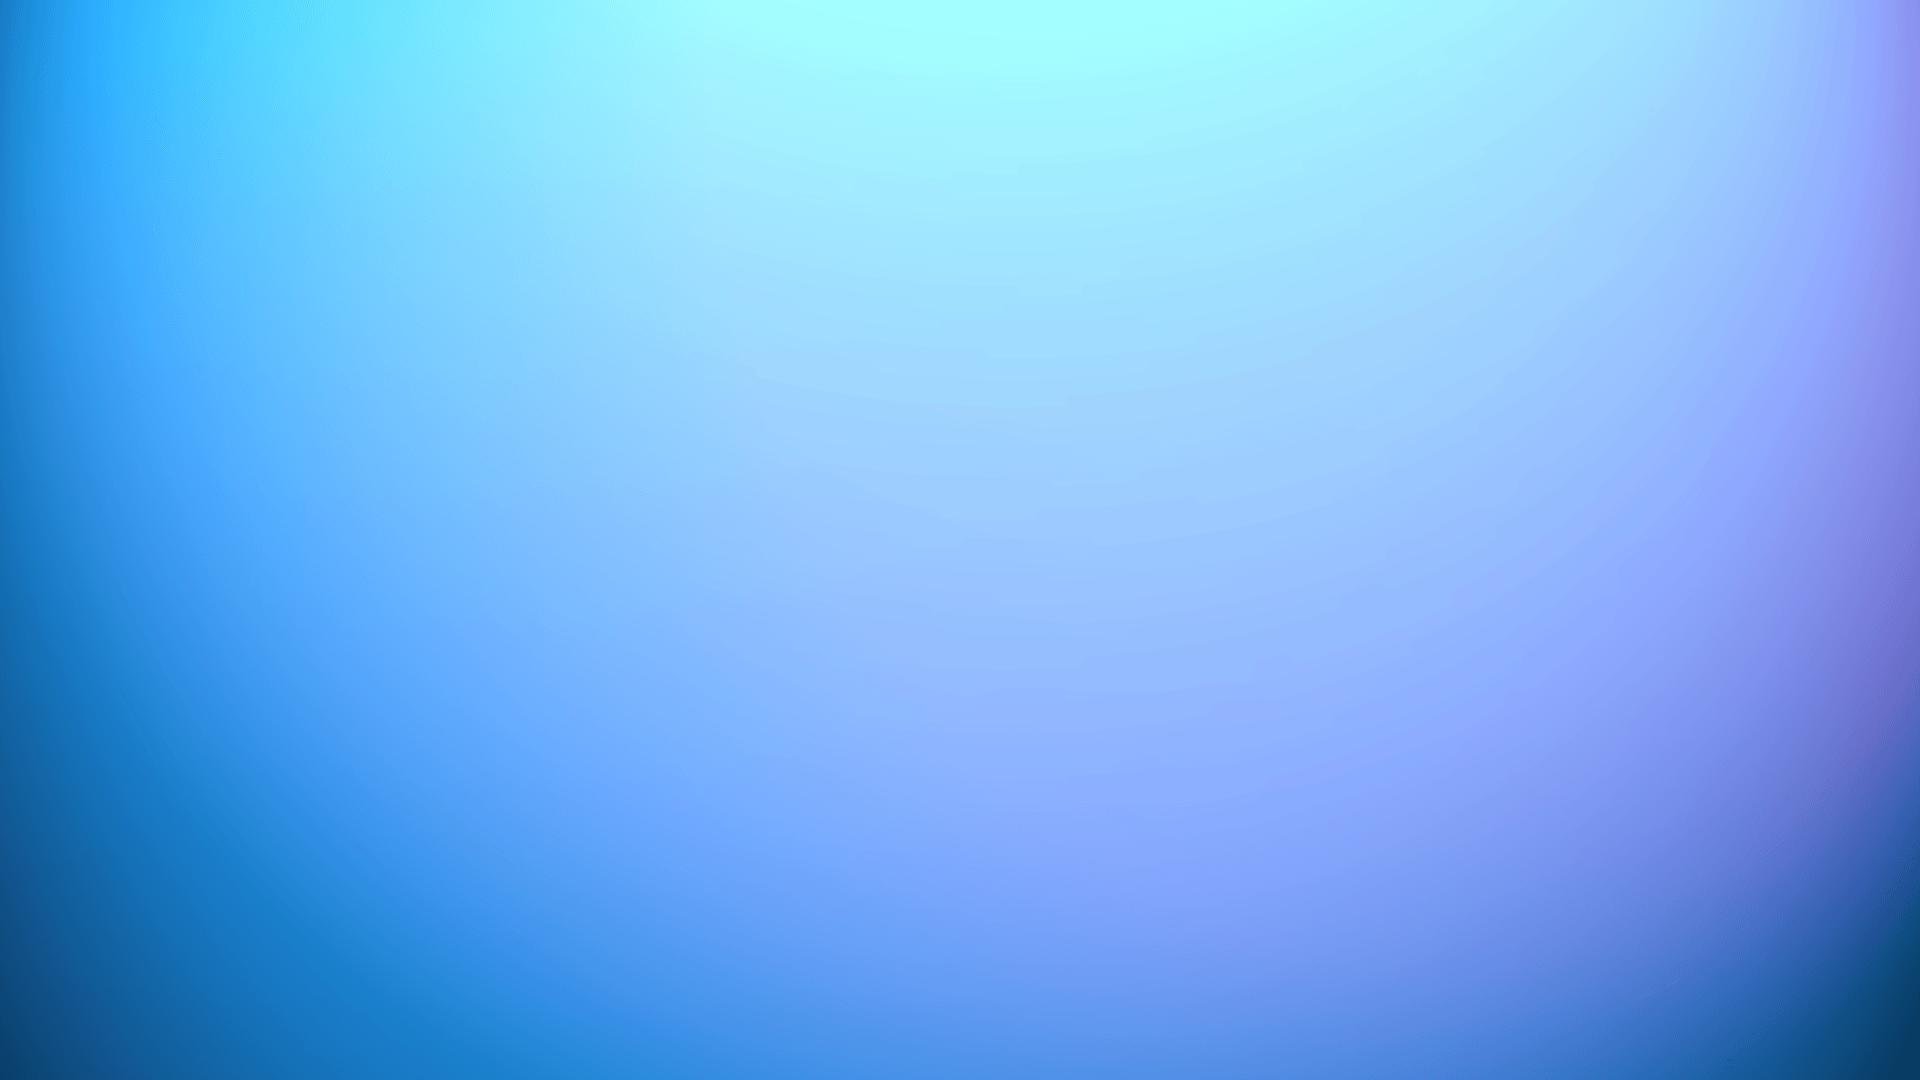 Blue Gradient Wallpapers Top Free Blue Gradient